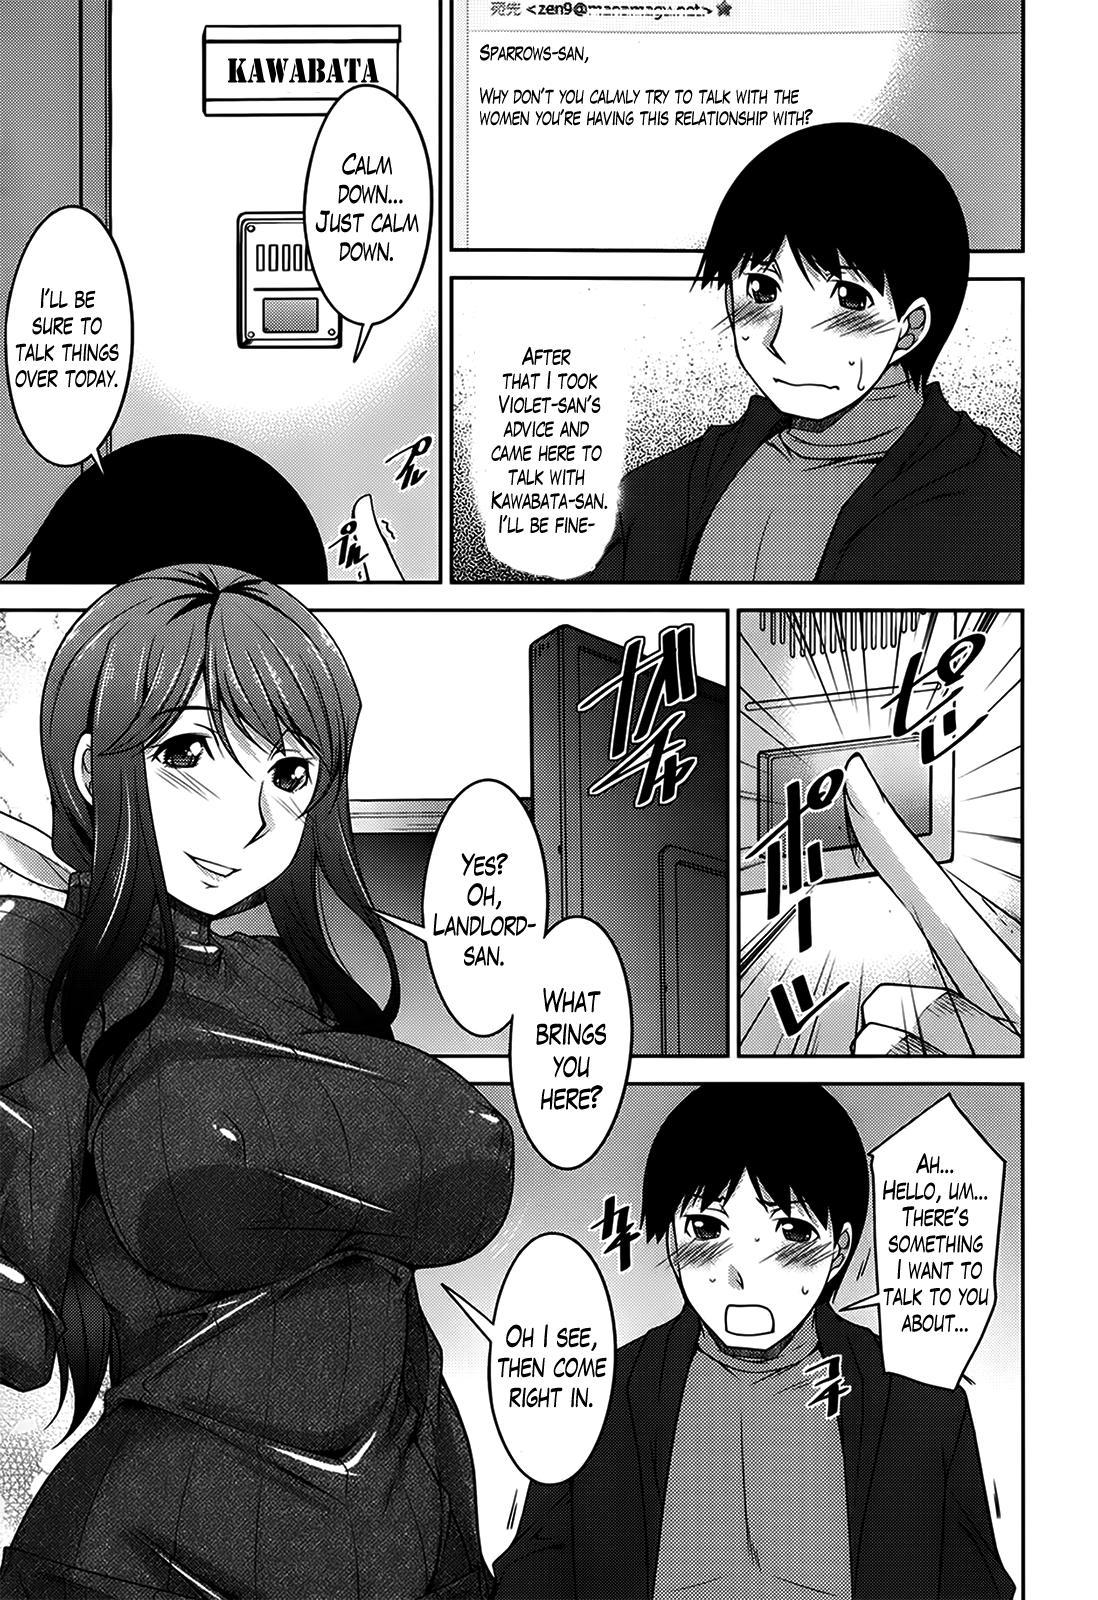 [Zen9] Taikutsu na Gogo no Sugoshikata Ch. 1-5   A Way to Spend a Boring Afternoon Ch. 1-5 (Action Pizazz DX 2013-12) [English](hentai2read.com)[Lazarus H] 60